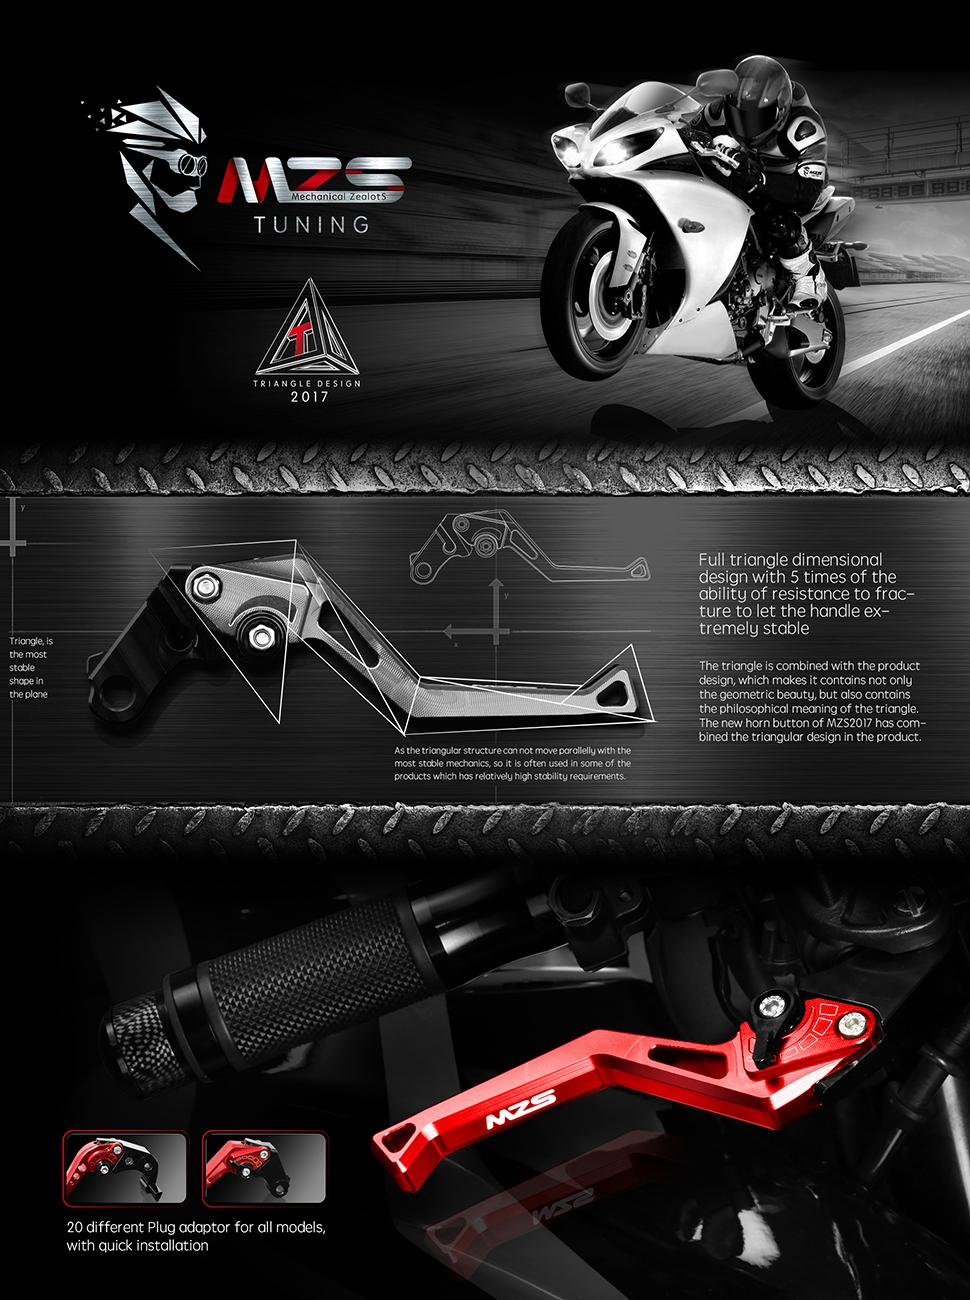 MZS Short Levers Brake Clutch Adjustment CNC for Triumph Bobber//Bonneville T120 Black//Street Cup//Street Twin//Tiger 800 XC XCX XR XRX//Thruxton 16-18// Tiger 1050 Sport 17-18// Scrambler Street 17-18